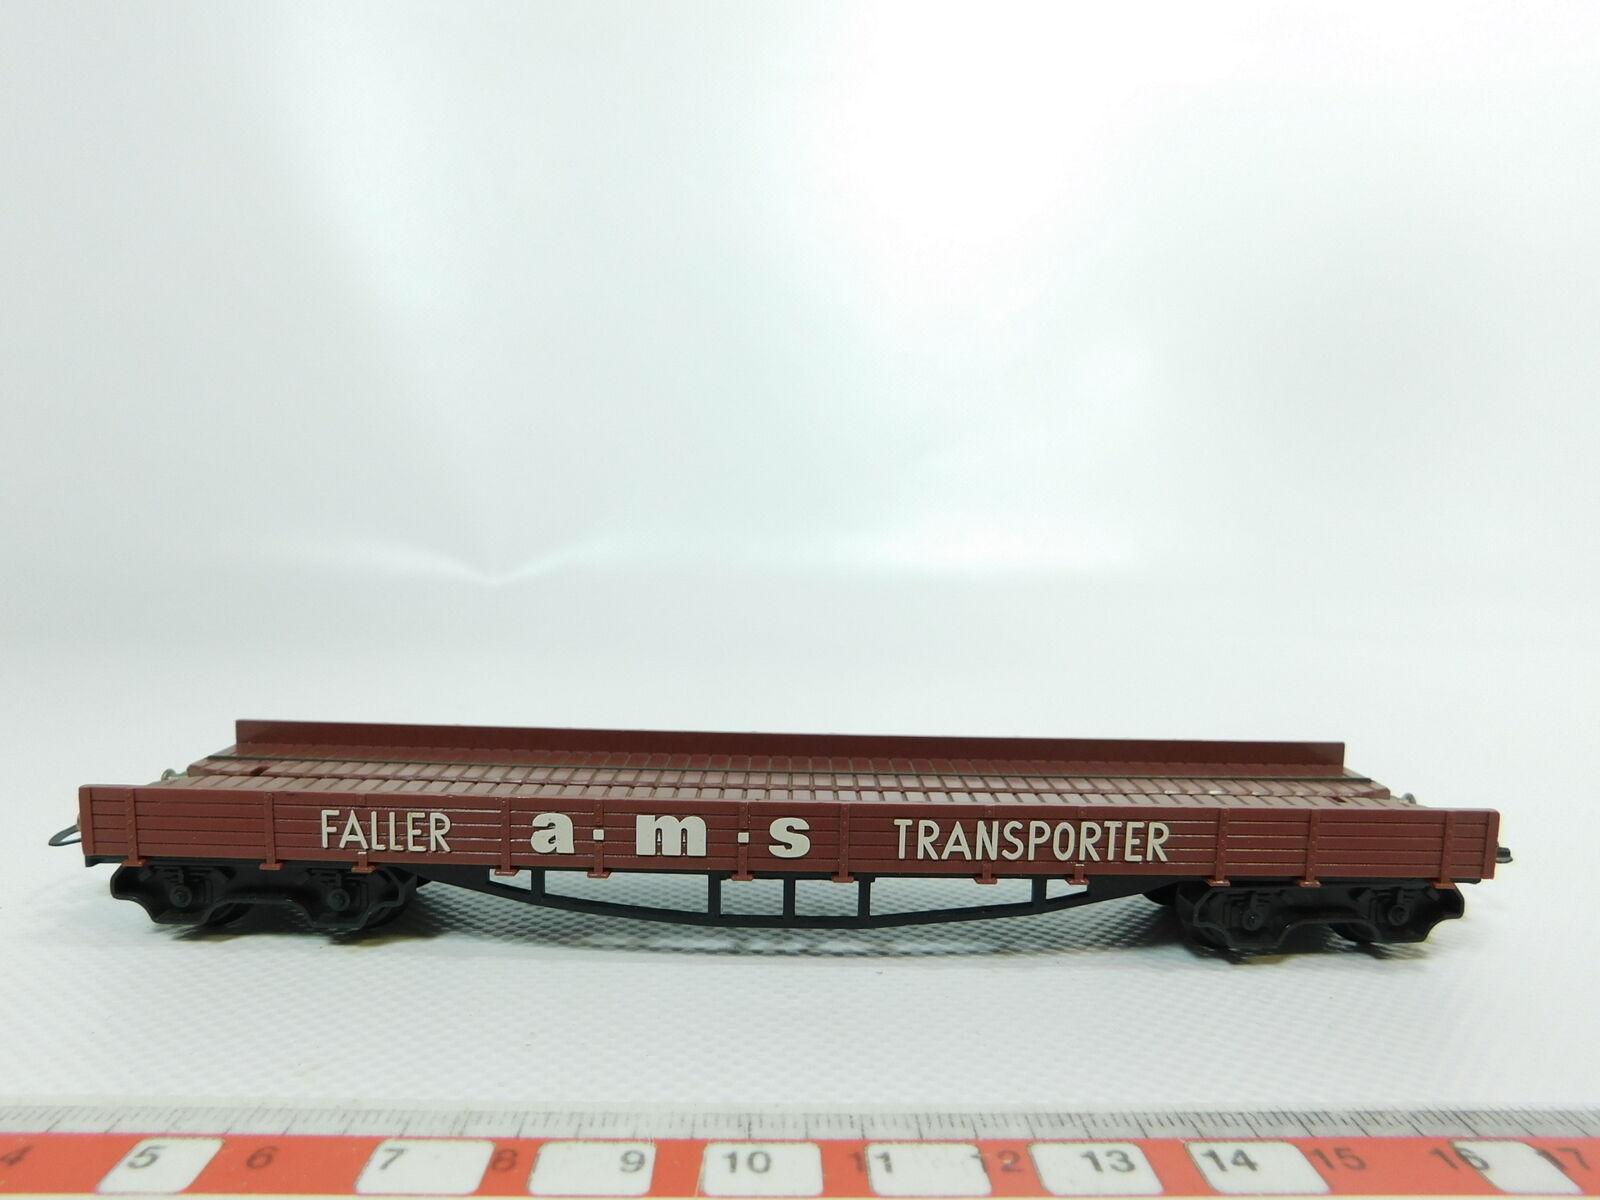 Bg809-0, 5  Faller AMS h0 dc 4541 auto Transporter auto carrello trasporto TRANSPORTER